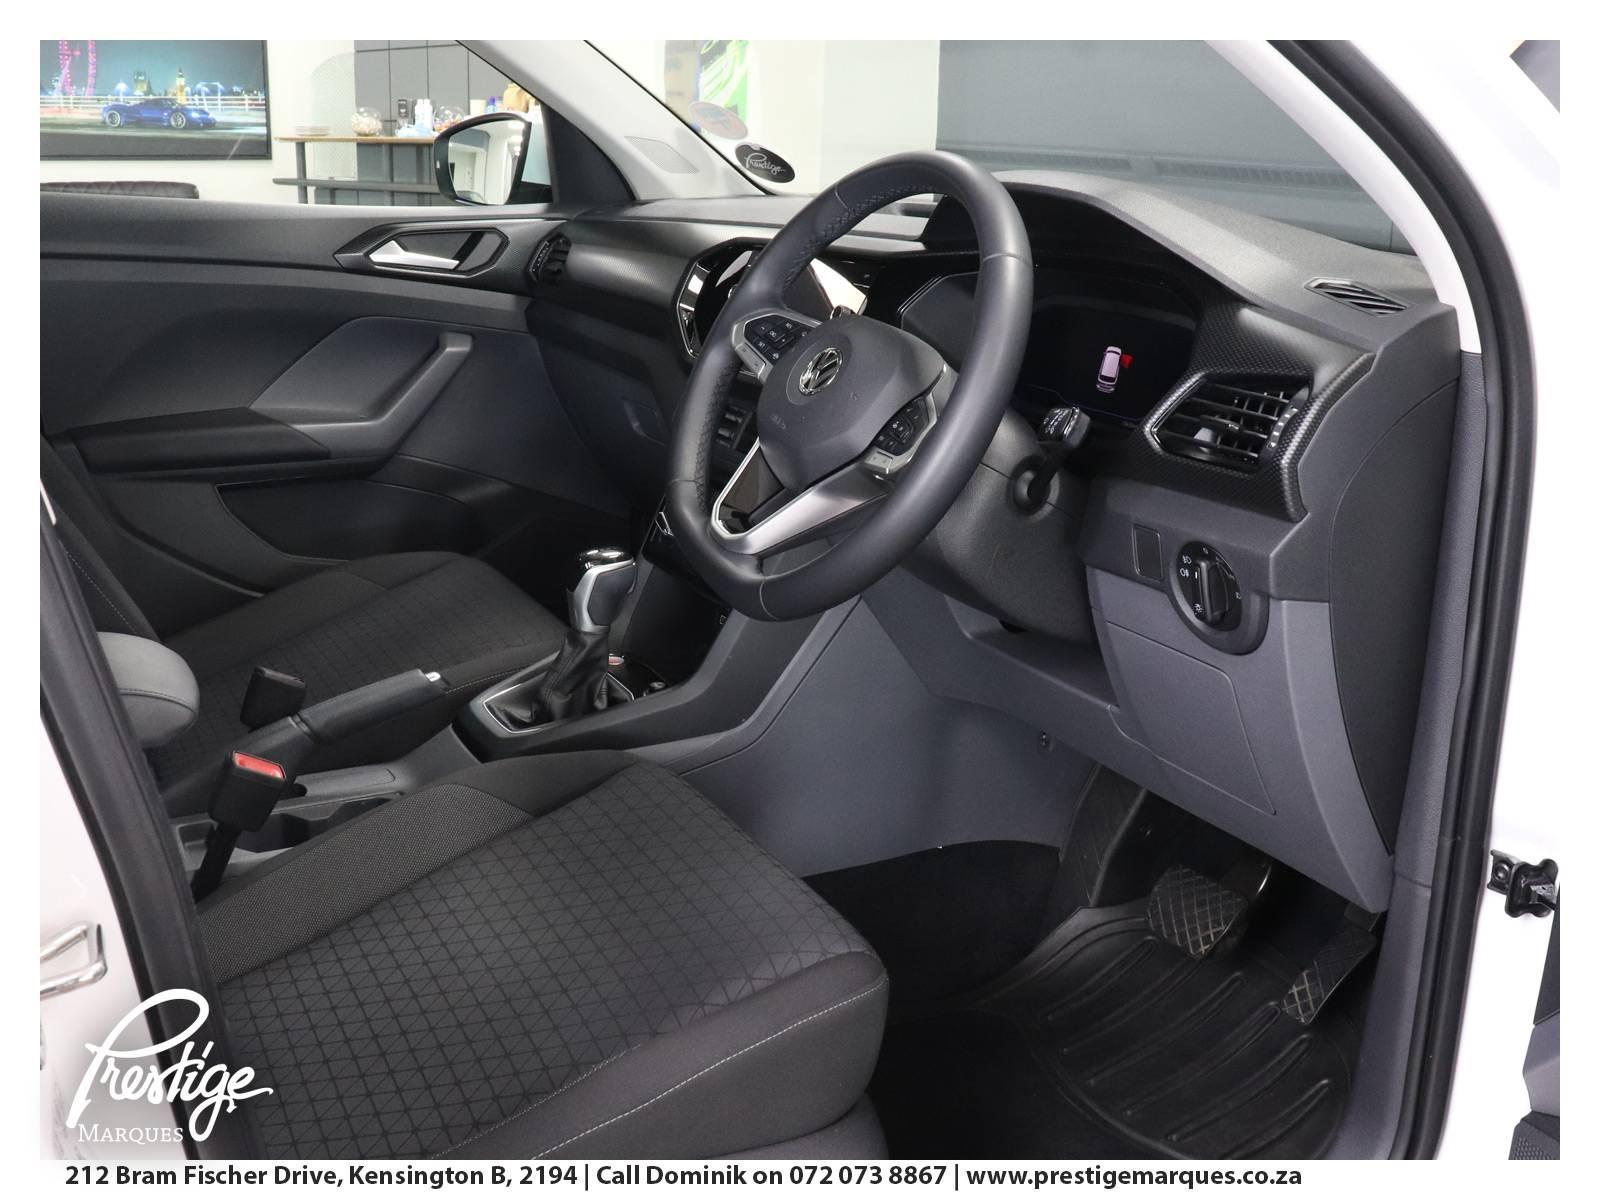 2019-Volkswagen-T-Cross-Prestige-Marques-Randburg-Sandton-12